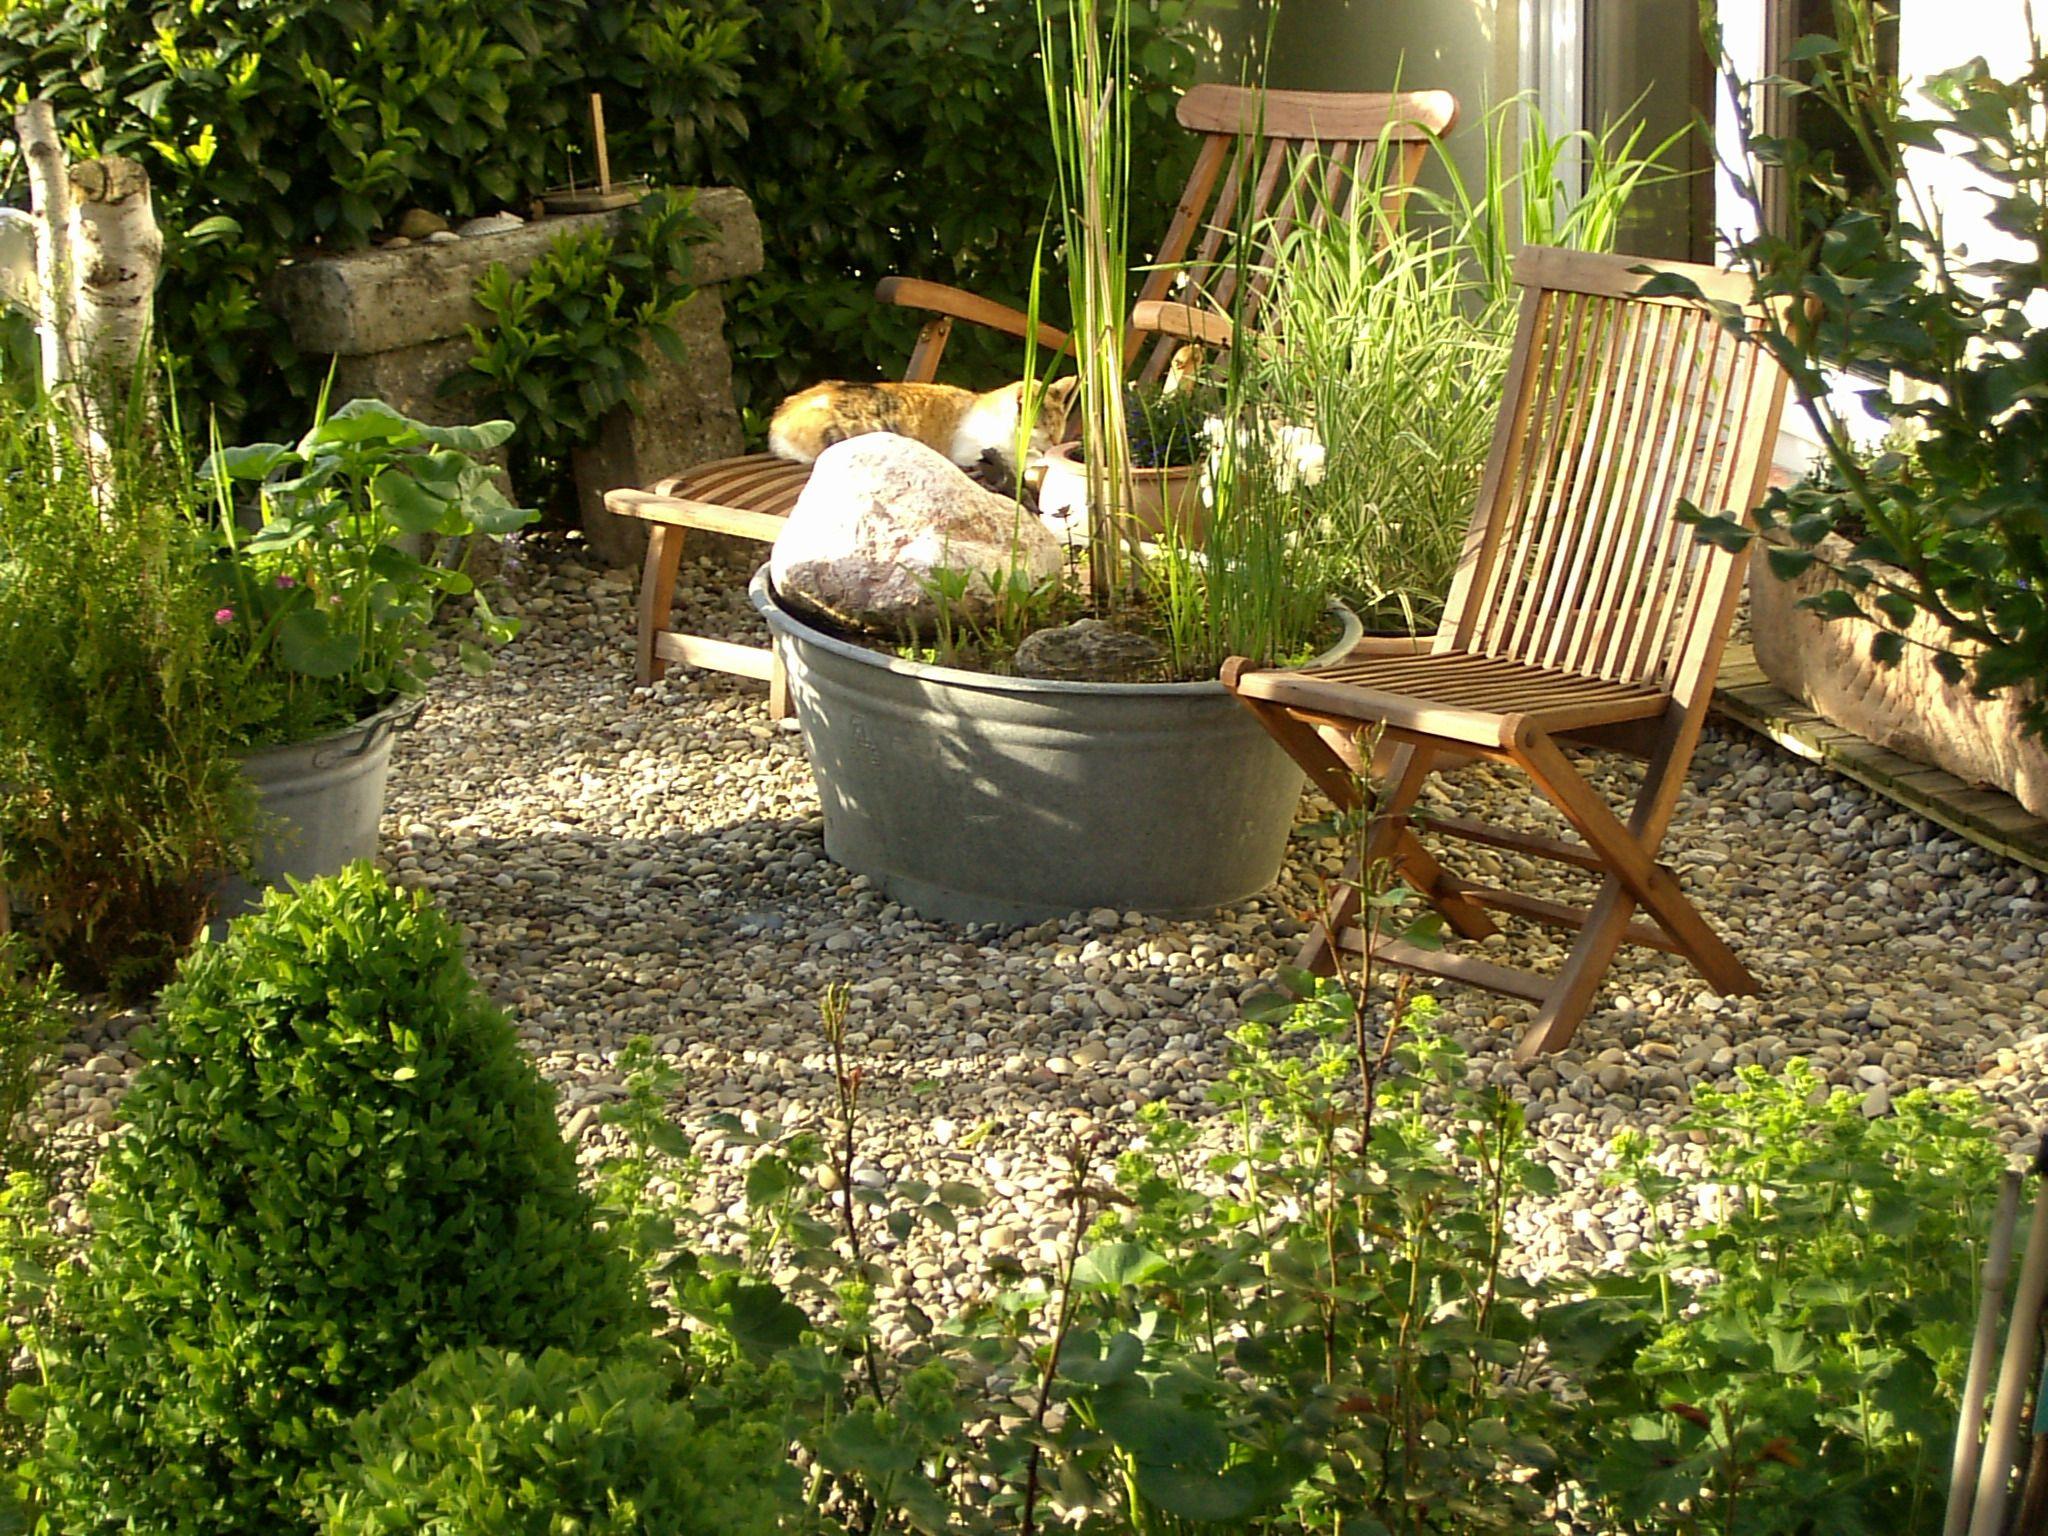 Sitzplatz Imgarten Unsertraumingruen Sitzplatzgarten Sitzecken Garten Garten Ideen Gemuse Gartengestaltung Ideen